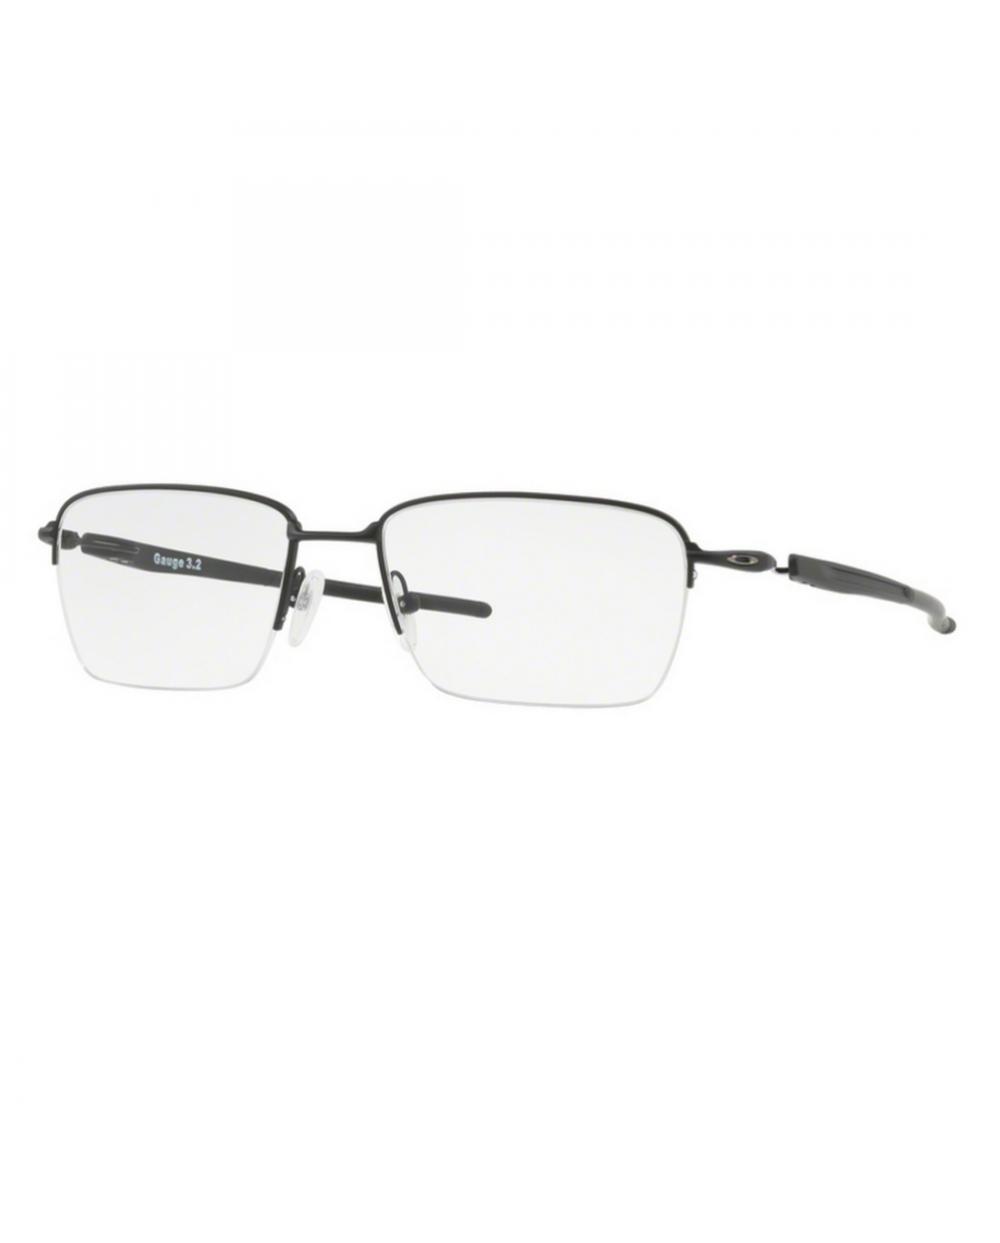 Les verres de lunettes de vue Oakley OX 5128 emballage d'origine garantie italie